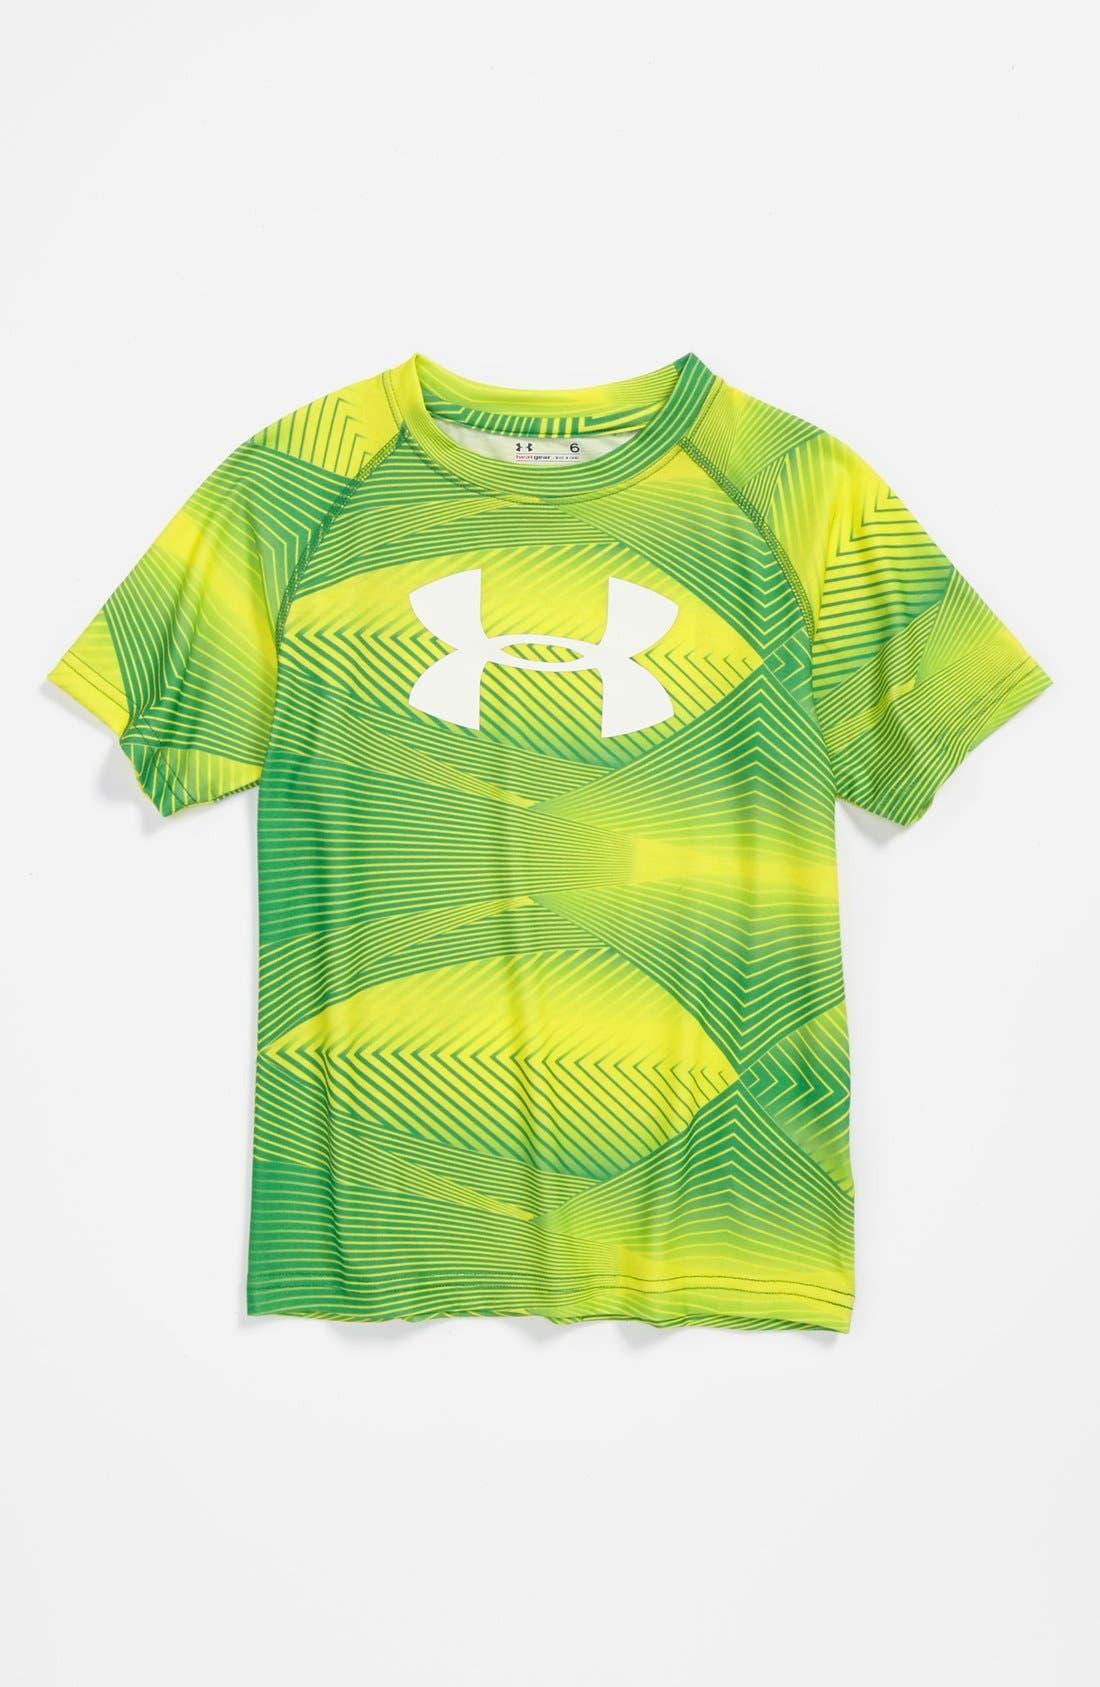 Alternate Image 1 Selected - Under Armour 'Ultralight' T-Shirt (Little Boys)